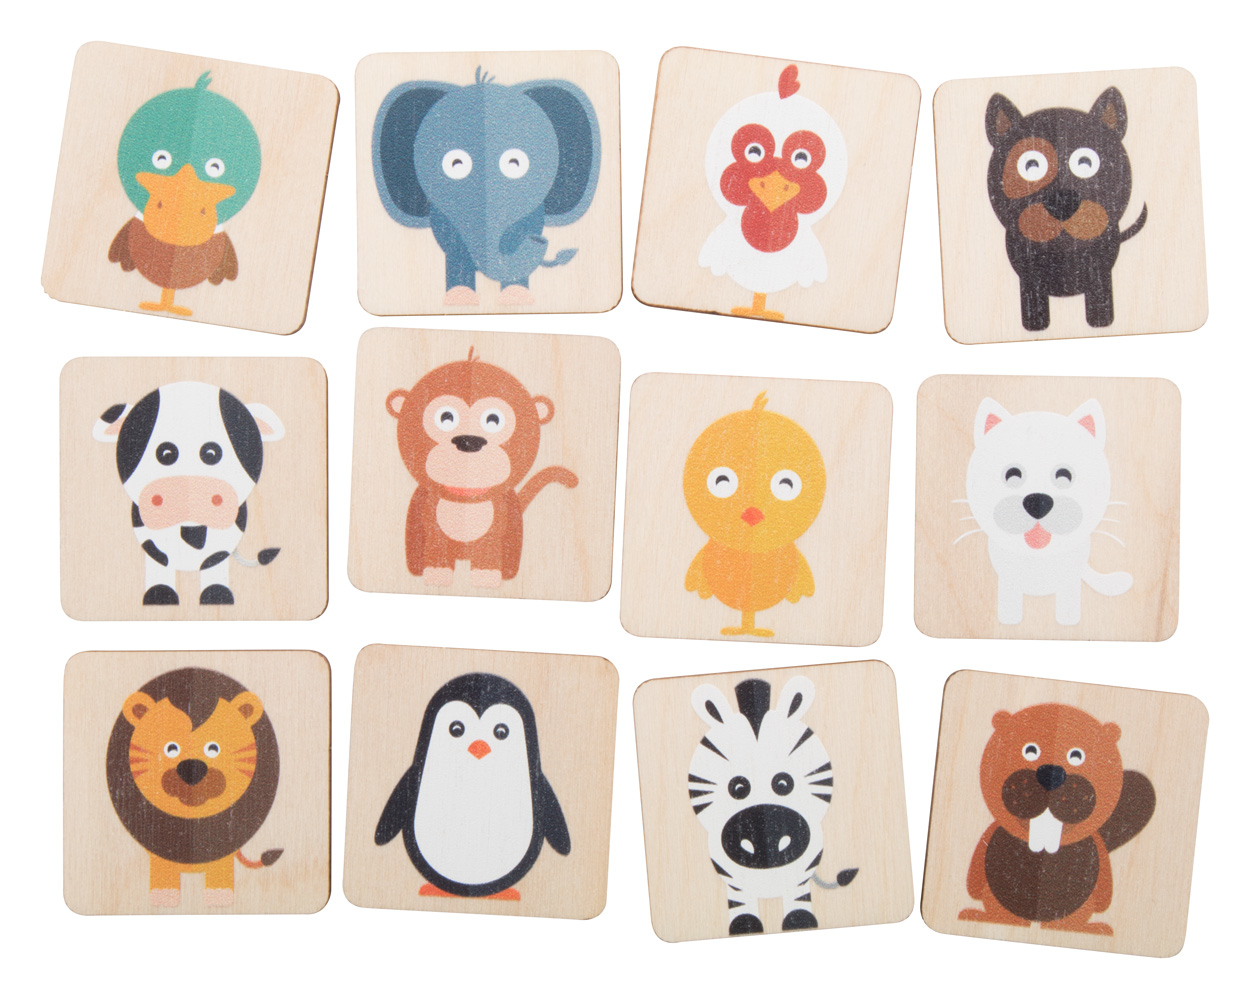 Immermor memory game, animals